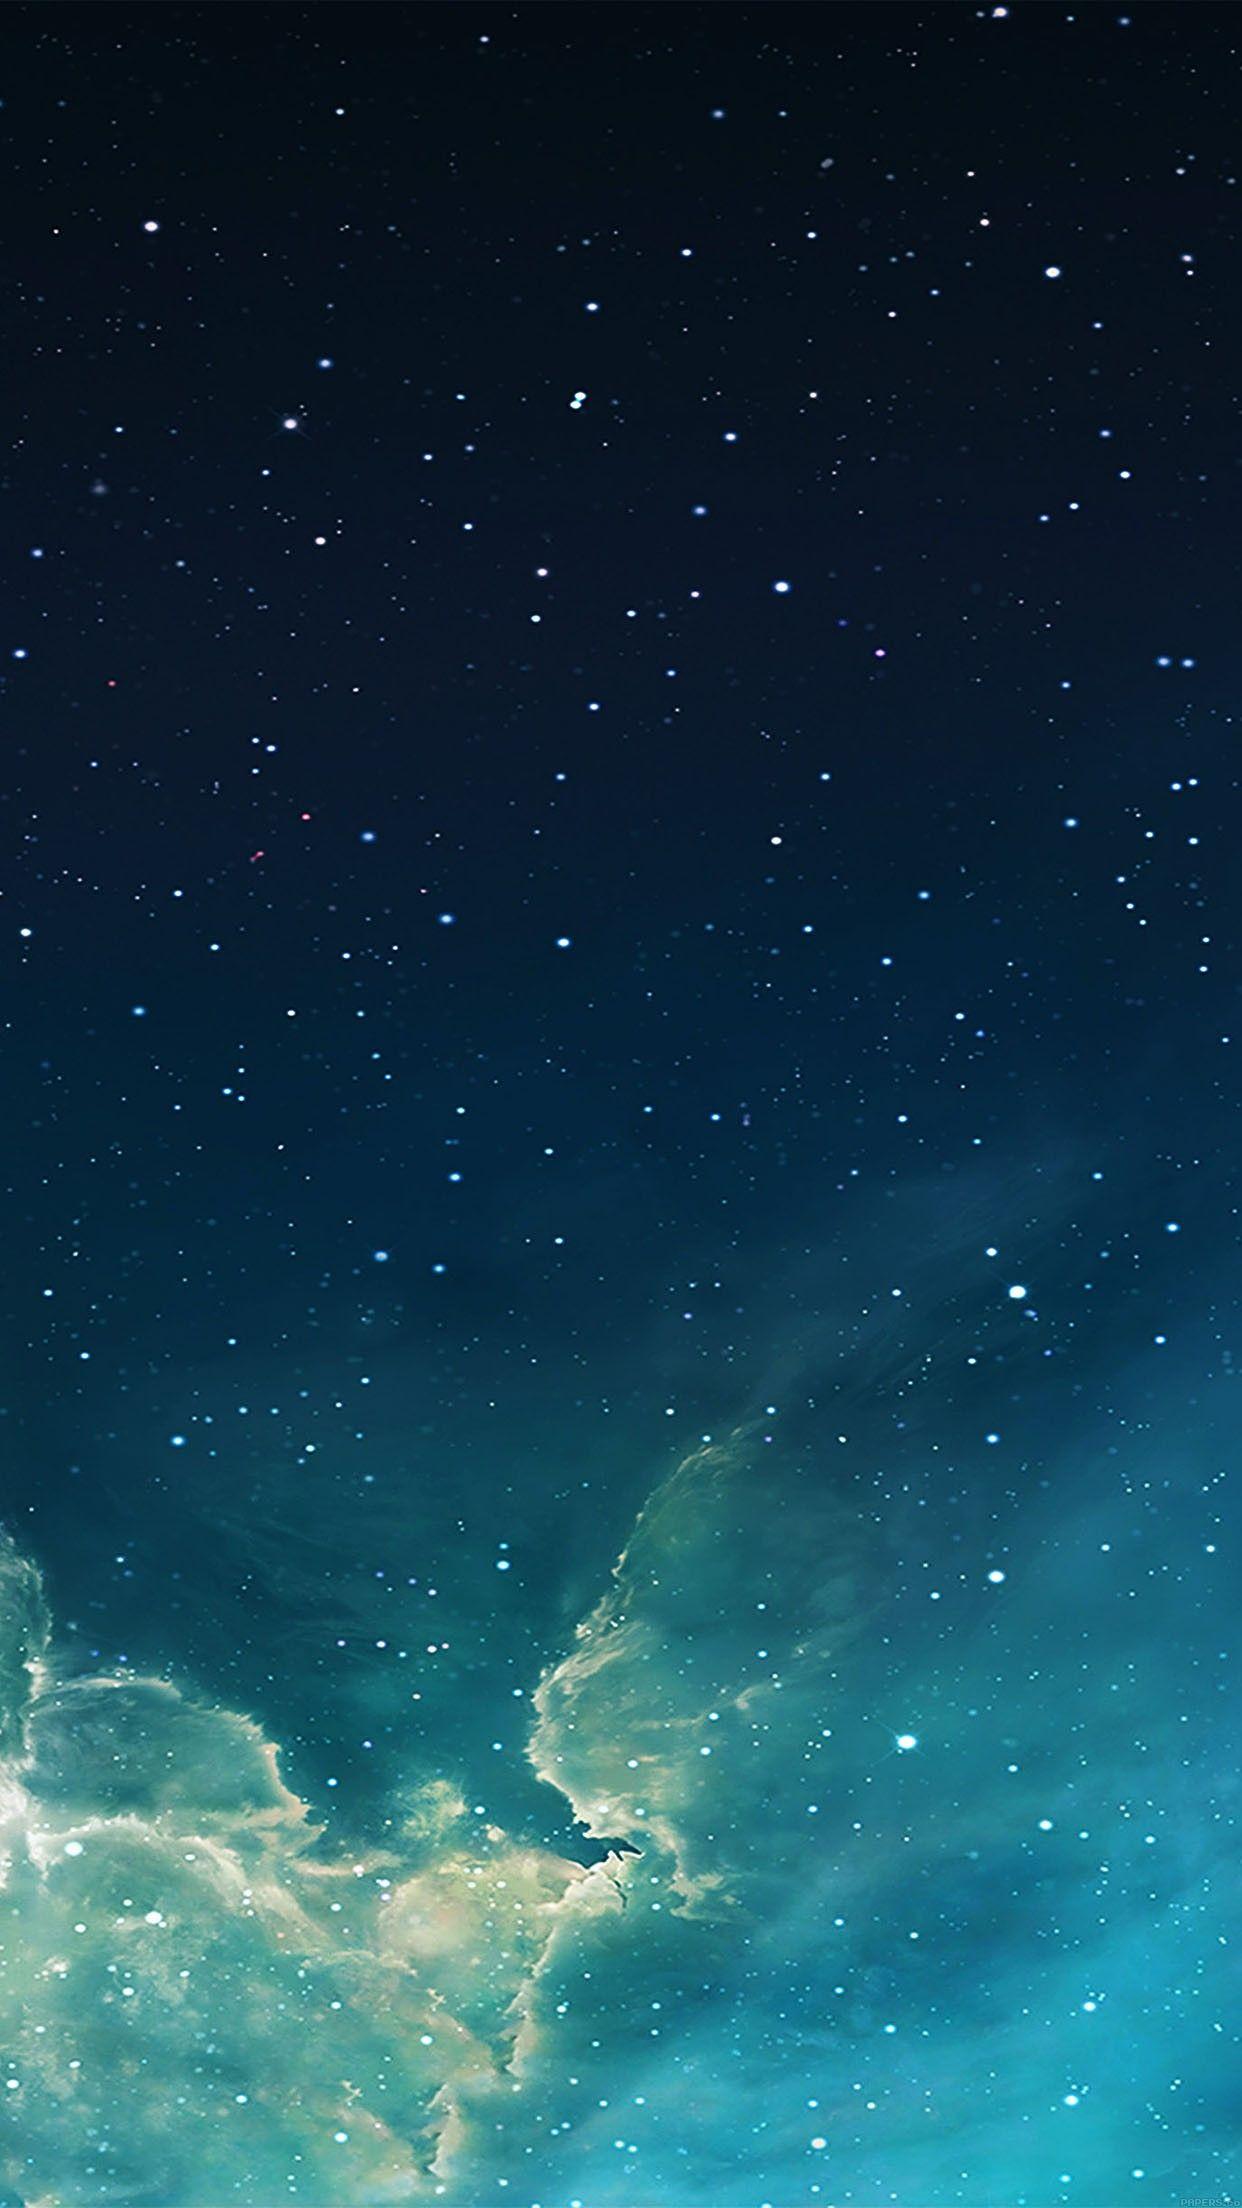 Deep Space iPhone Wallpapers 10